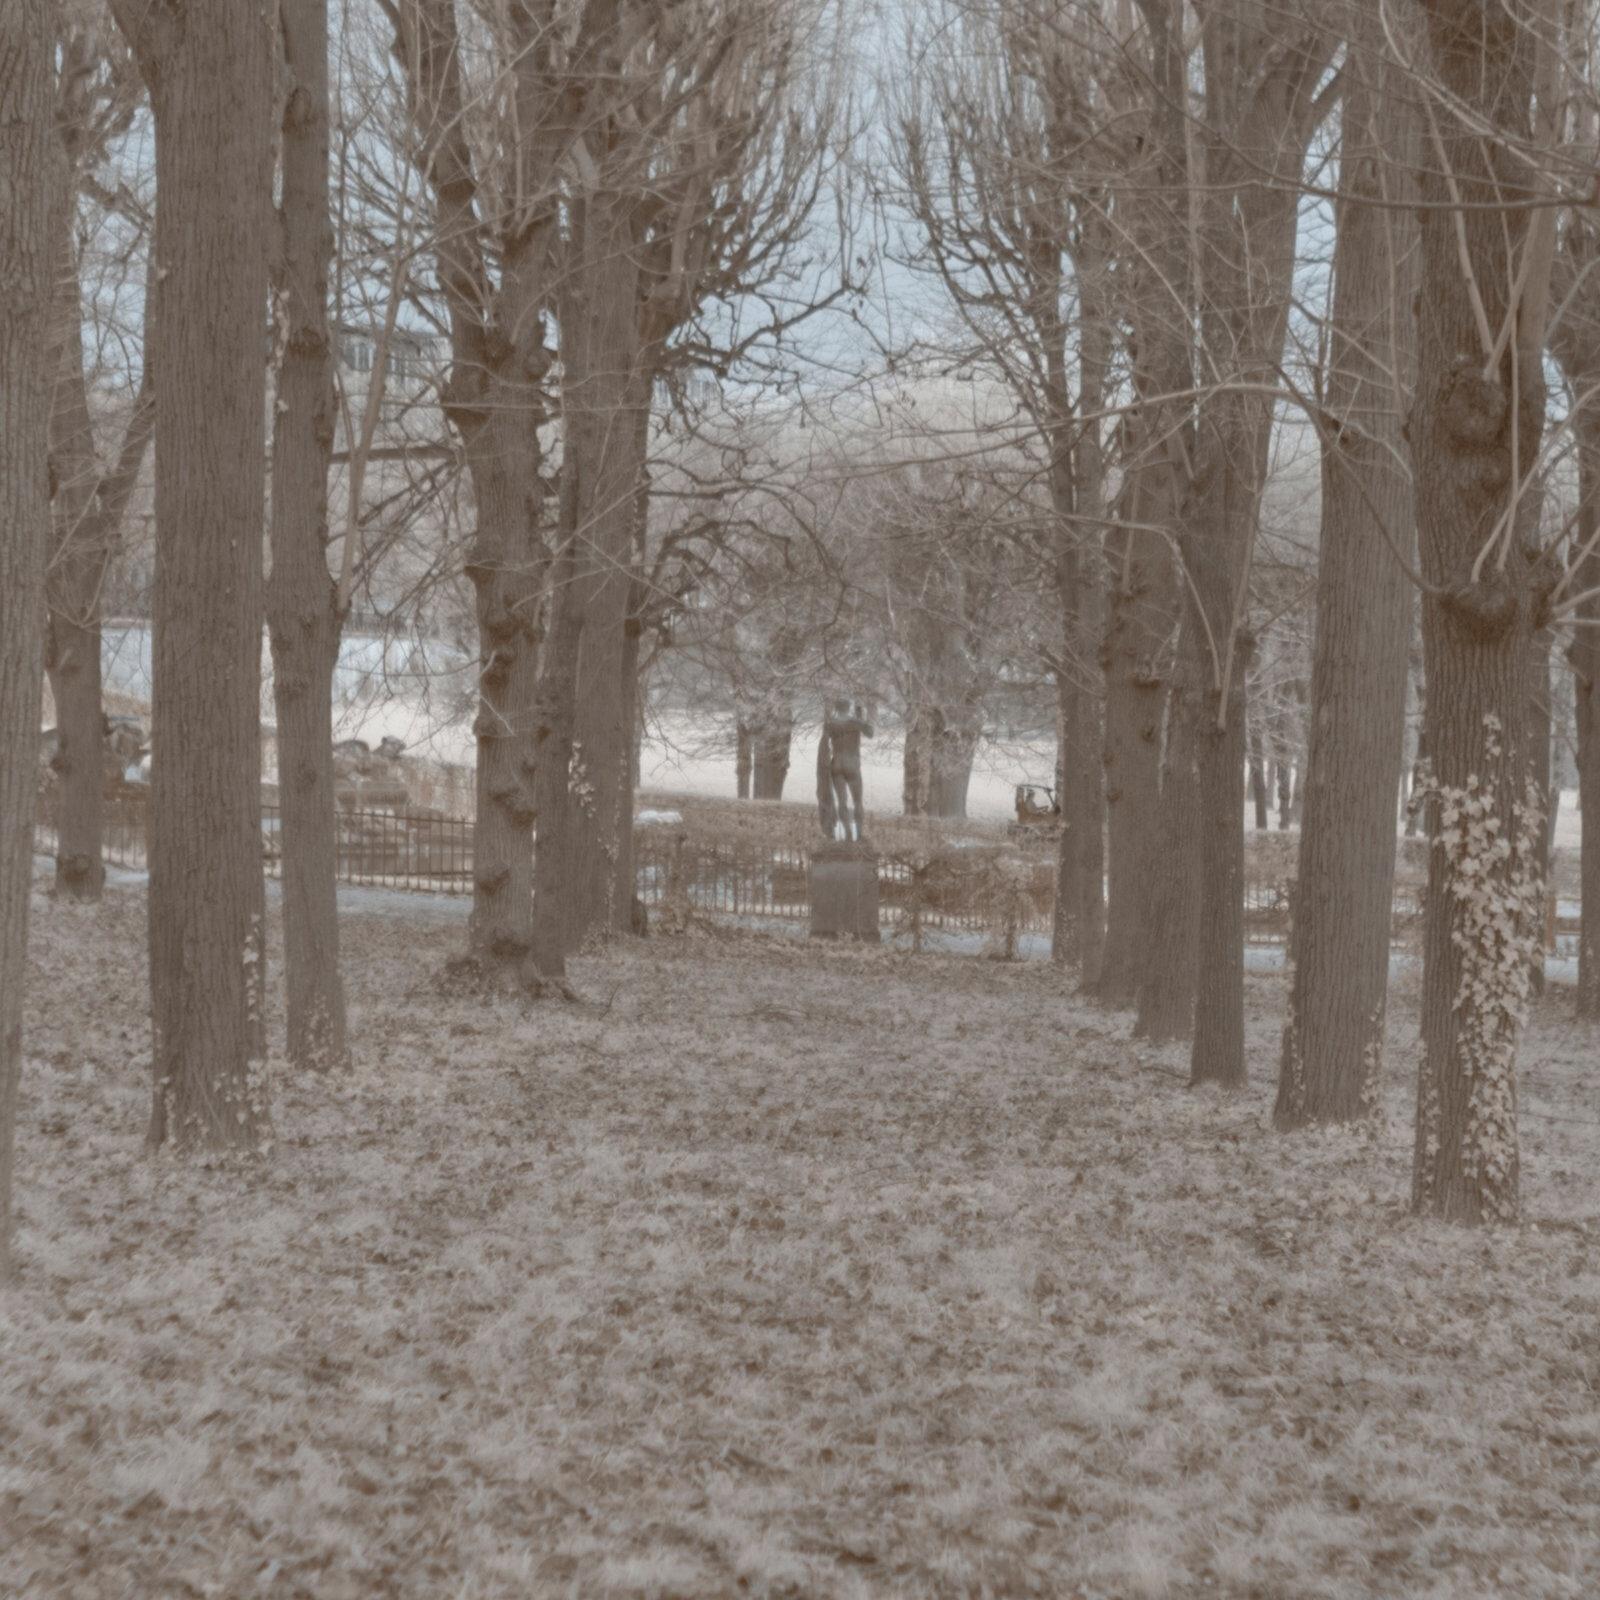 DETAILS 2 24mm F1.4 SIGMA 1 | Pierre-Louis Ferrer | Test du SIGMA 24mm F/1.4 DG HSM Art en photographie infrarouge | Partie 1